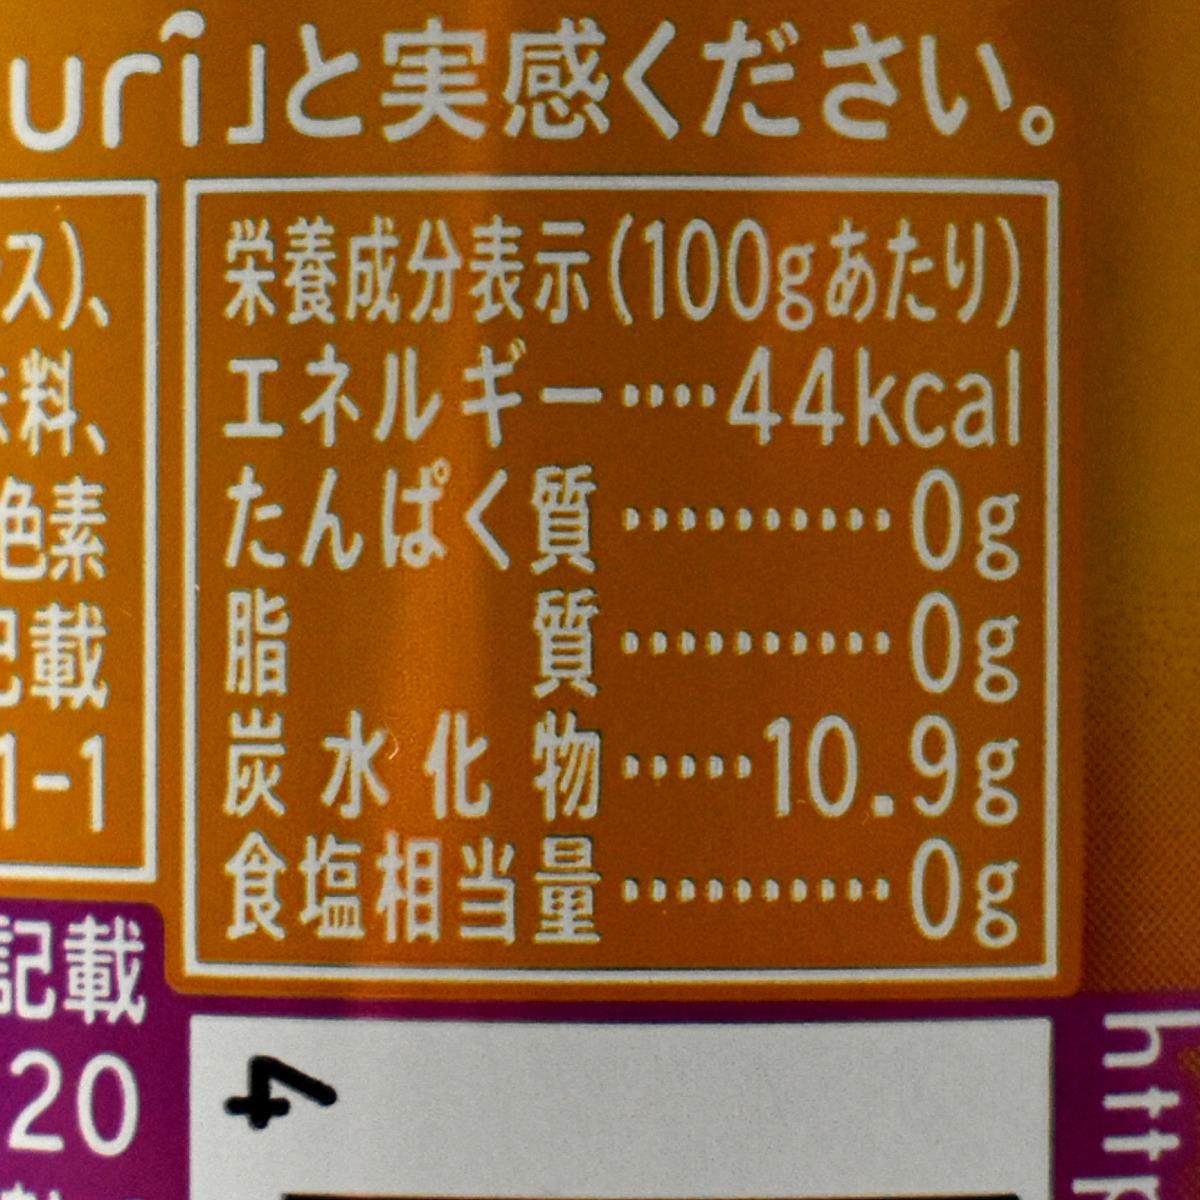 Gokuri カシス&オレンジの栄養成分表示